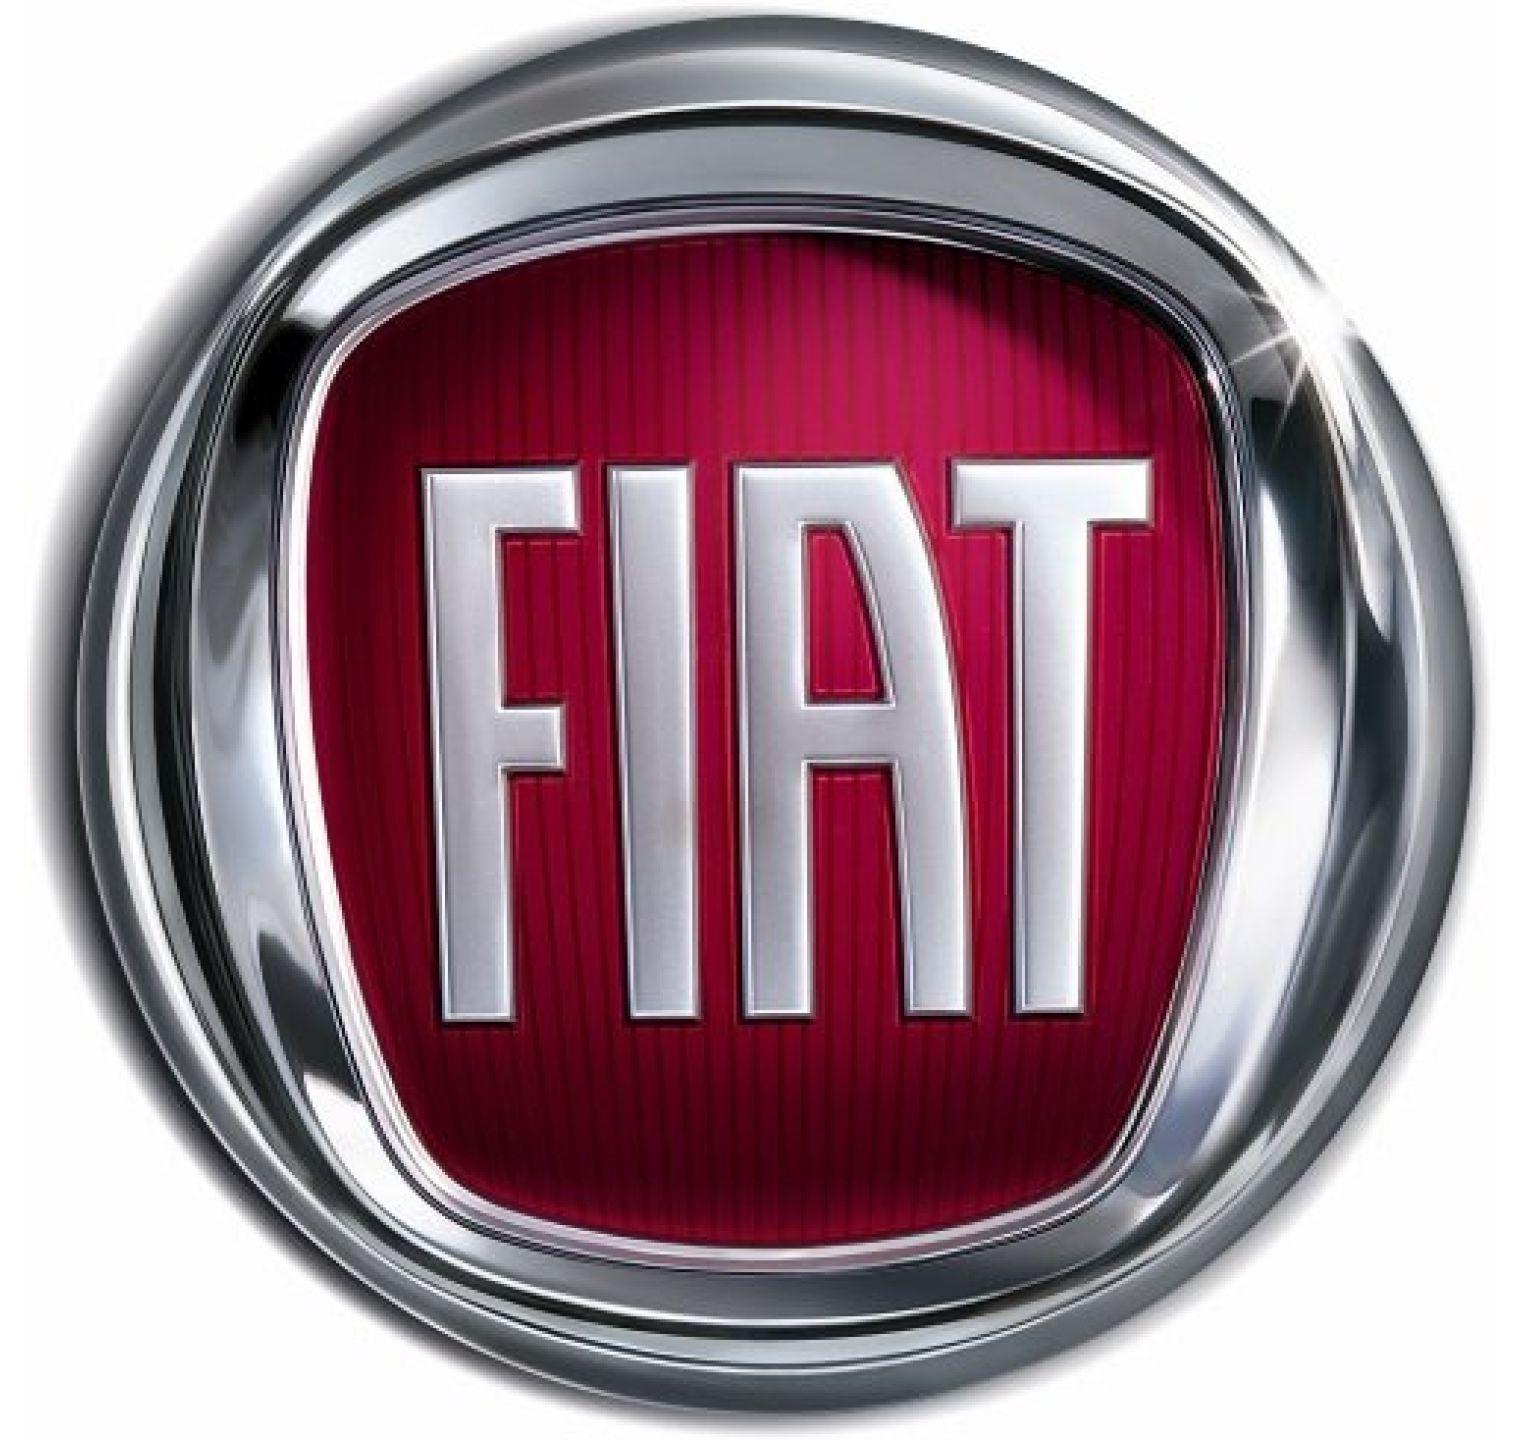 Fiat Bravo II (vanaf 2006) - set ruitenwissers Valeo Silencio flatblade